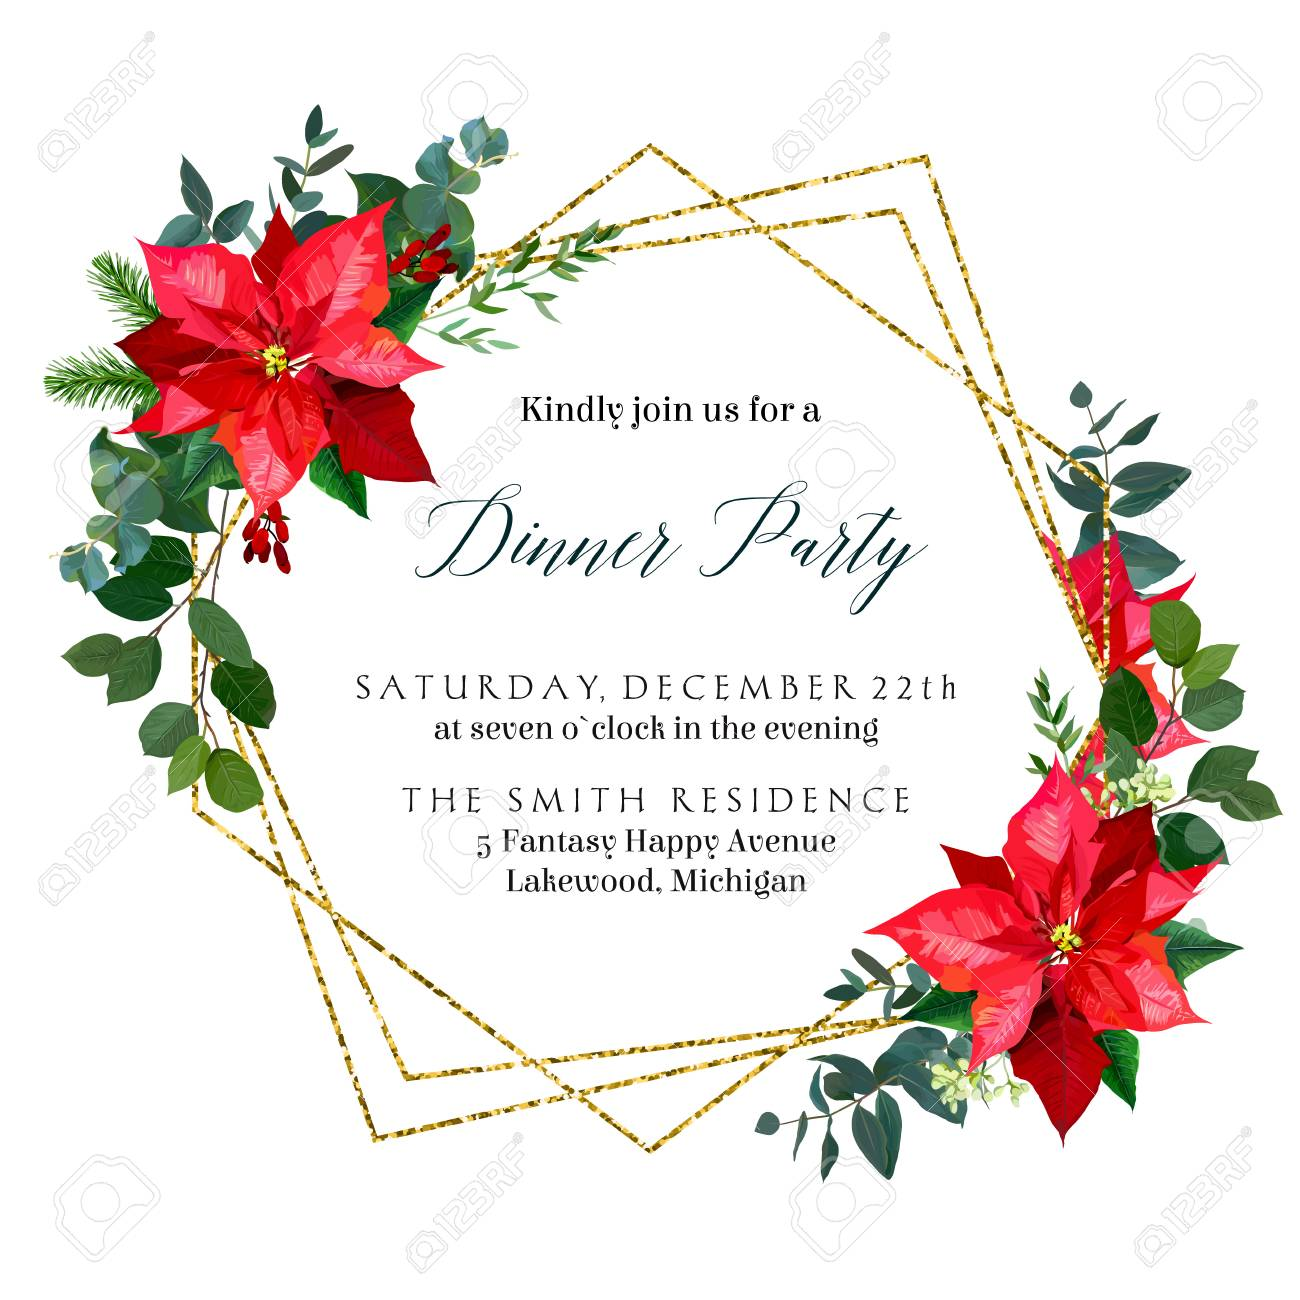 Christmas Greenery Vector.Red Poinsettia Flowers Christmas Greenery Mix Of Seasonal Plan